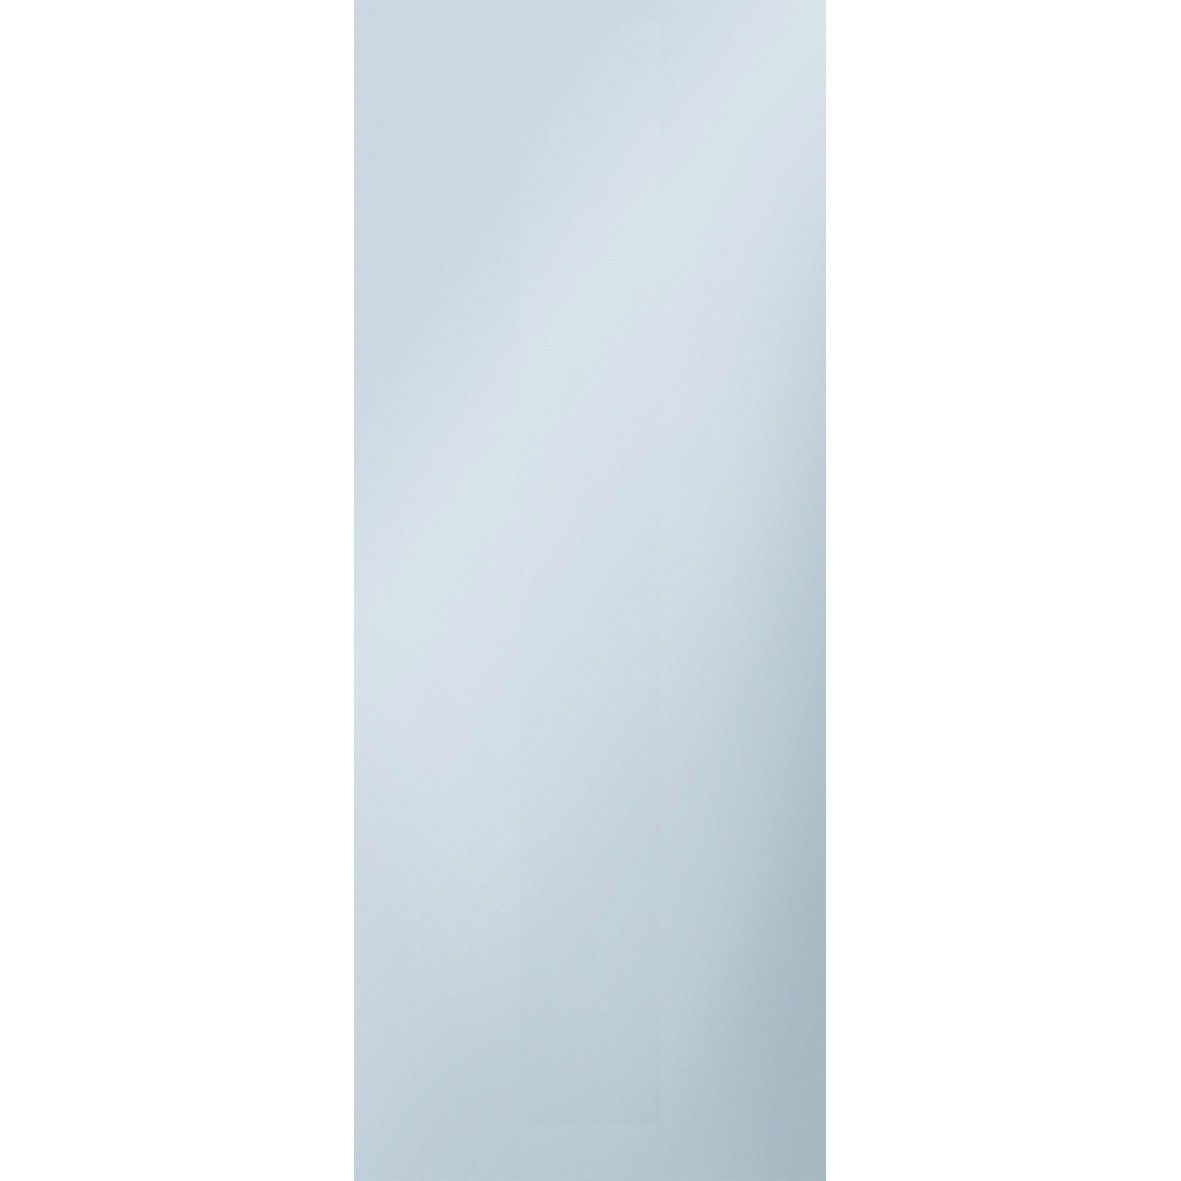 Porte coulissante verre tremp translucide eclisse 211 x - Leroy merlin porte coulissante verre ...